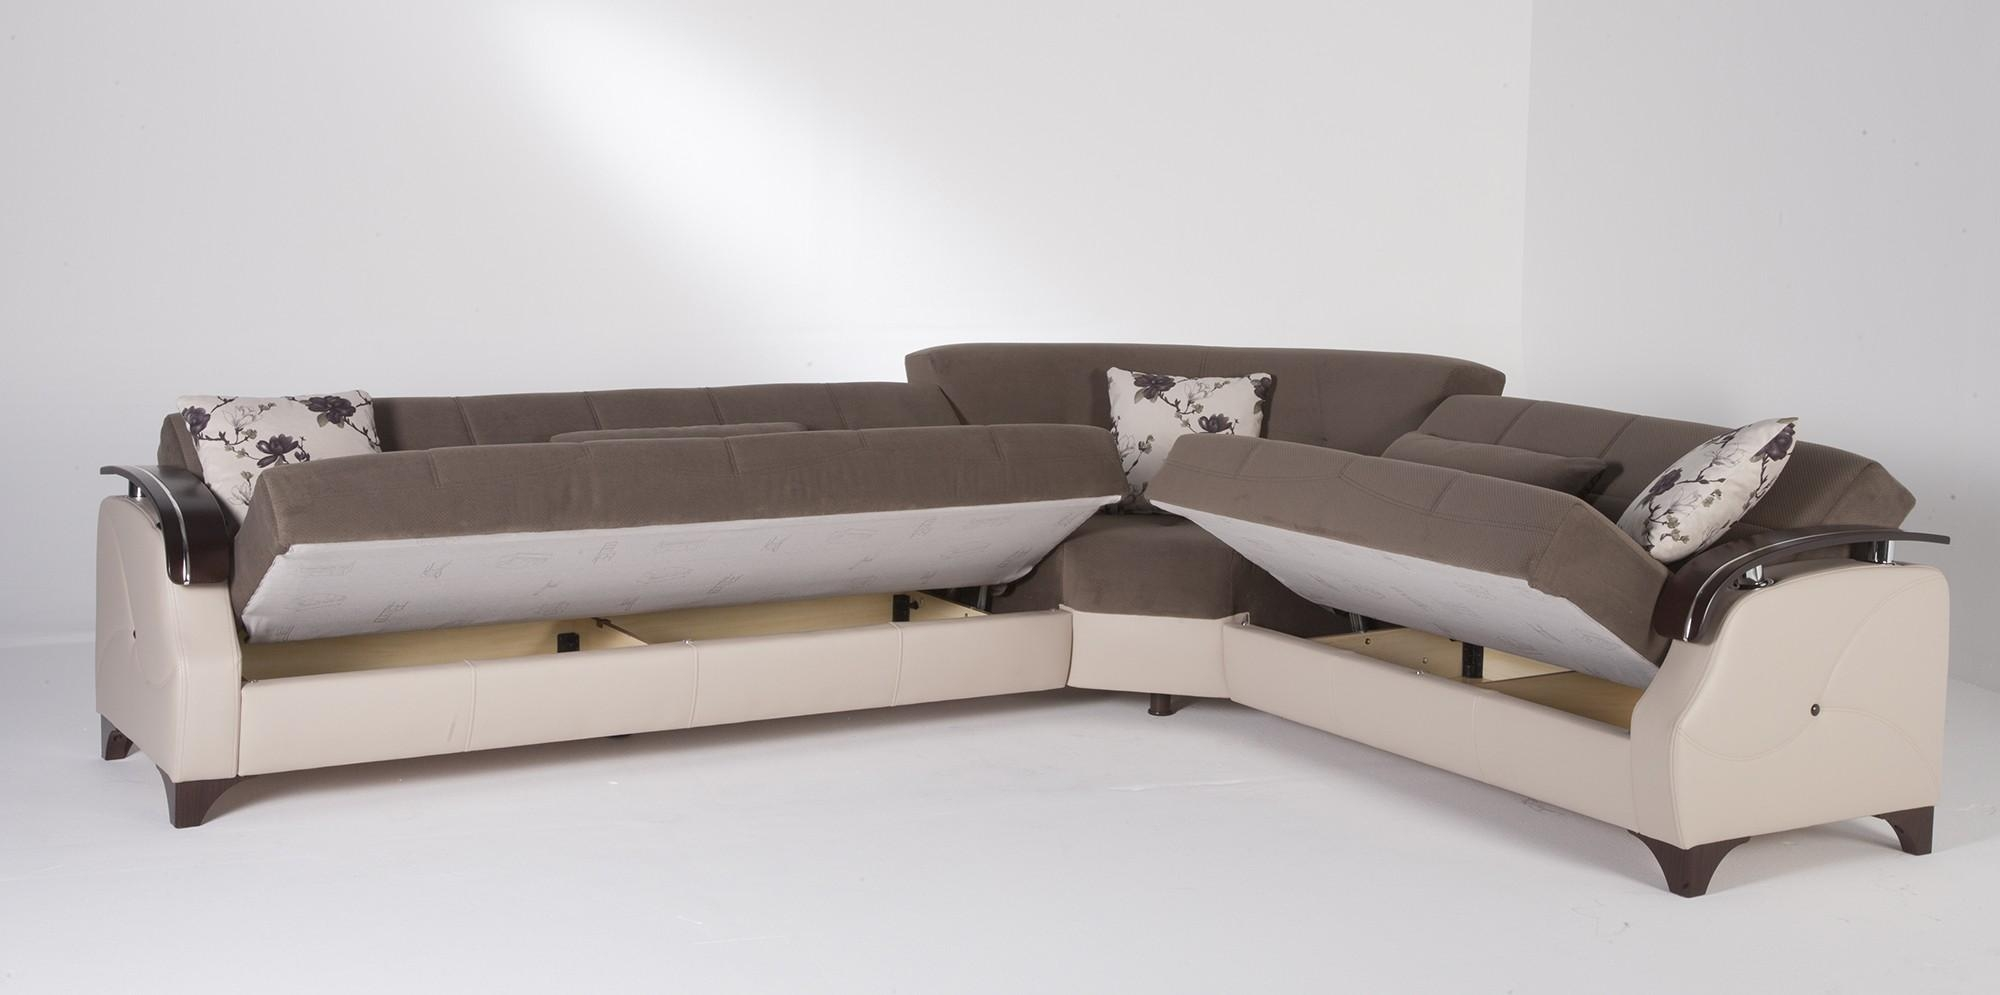 Sofa : Queen Sofa Sleeper Sectional Microfiber Beautiful Home Pertaining To Queen Sofa Sleeper Sectional Microfiber (Image 15 of 20)